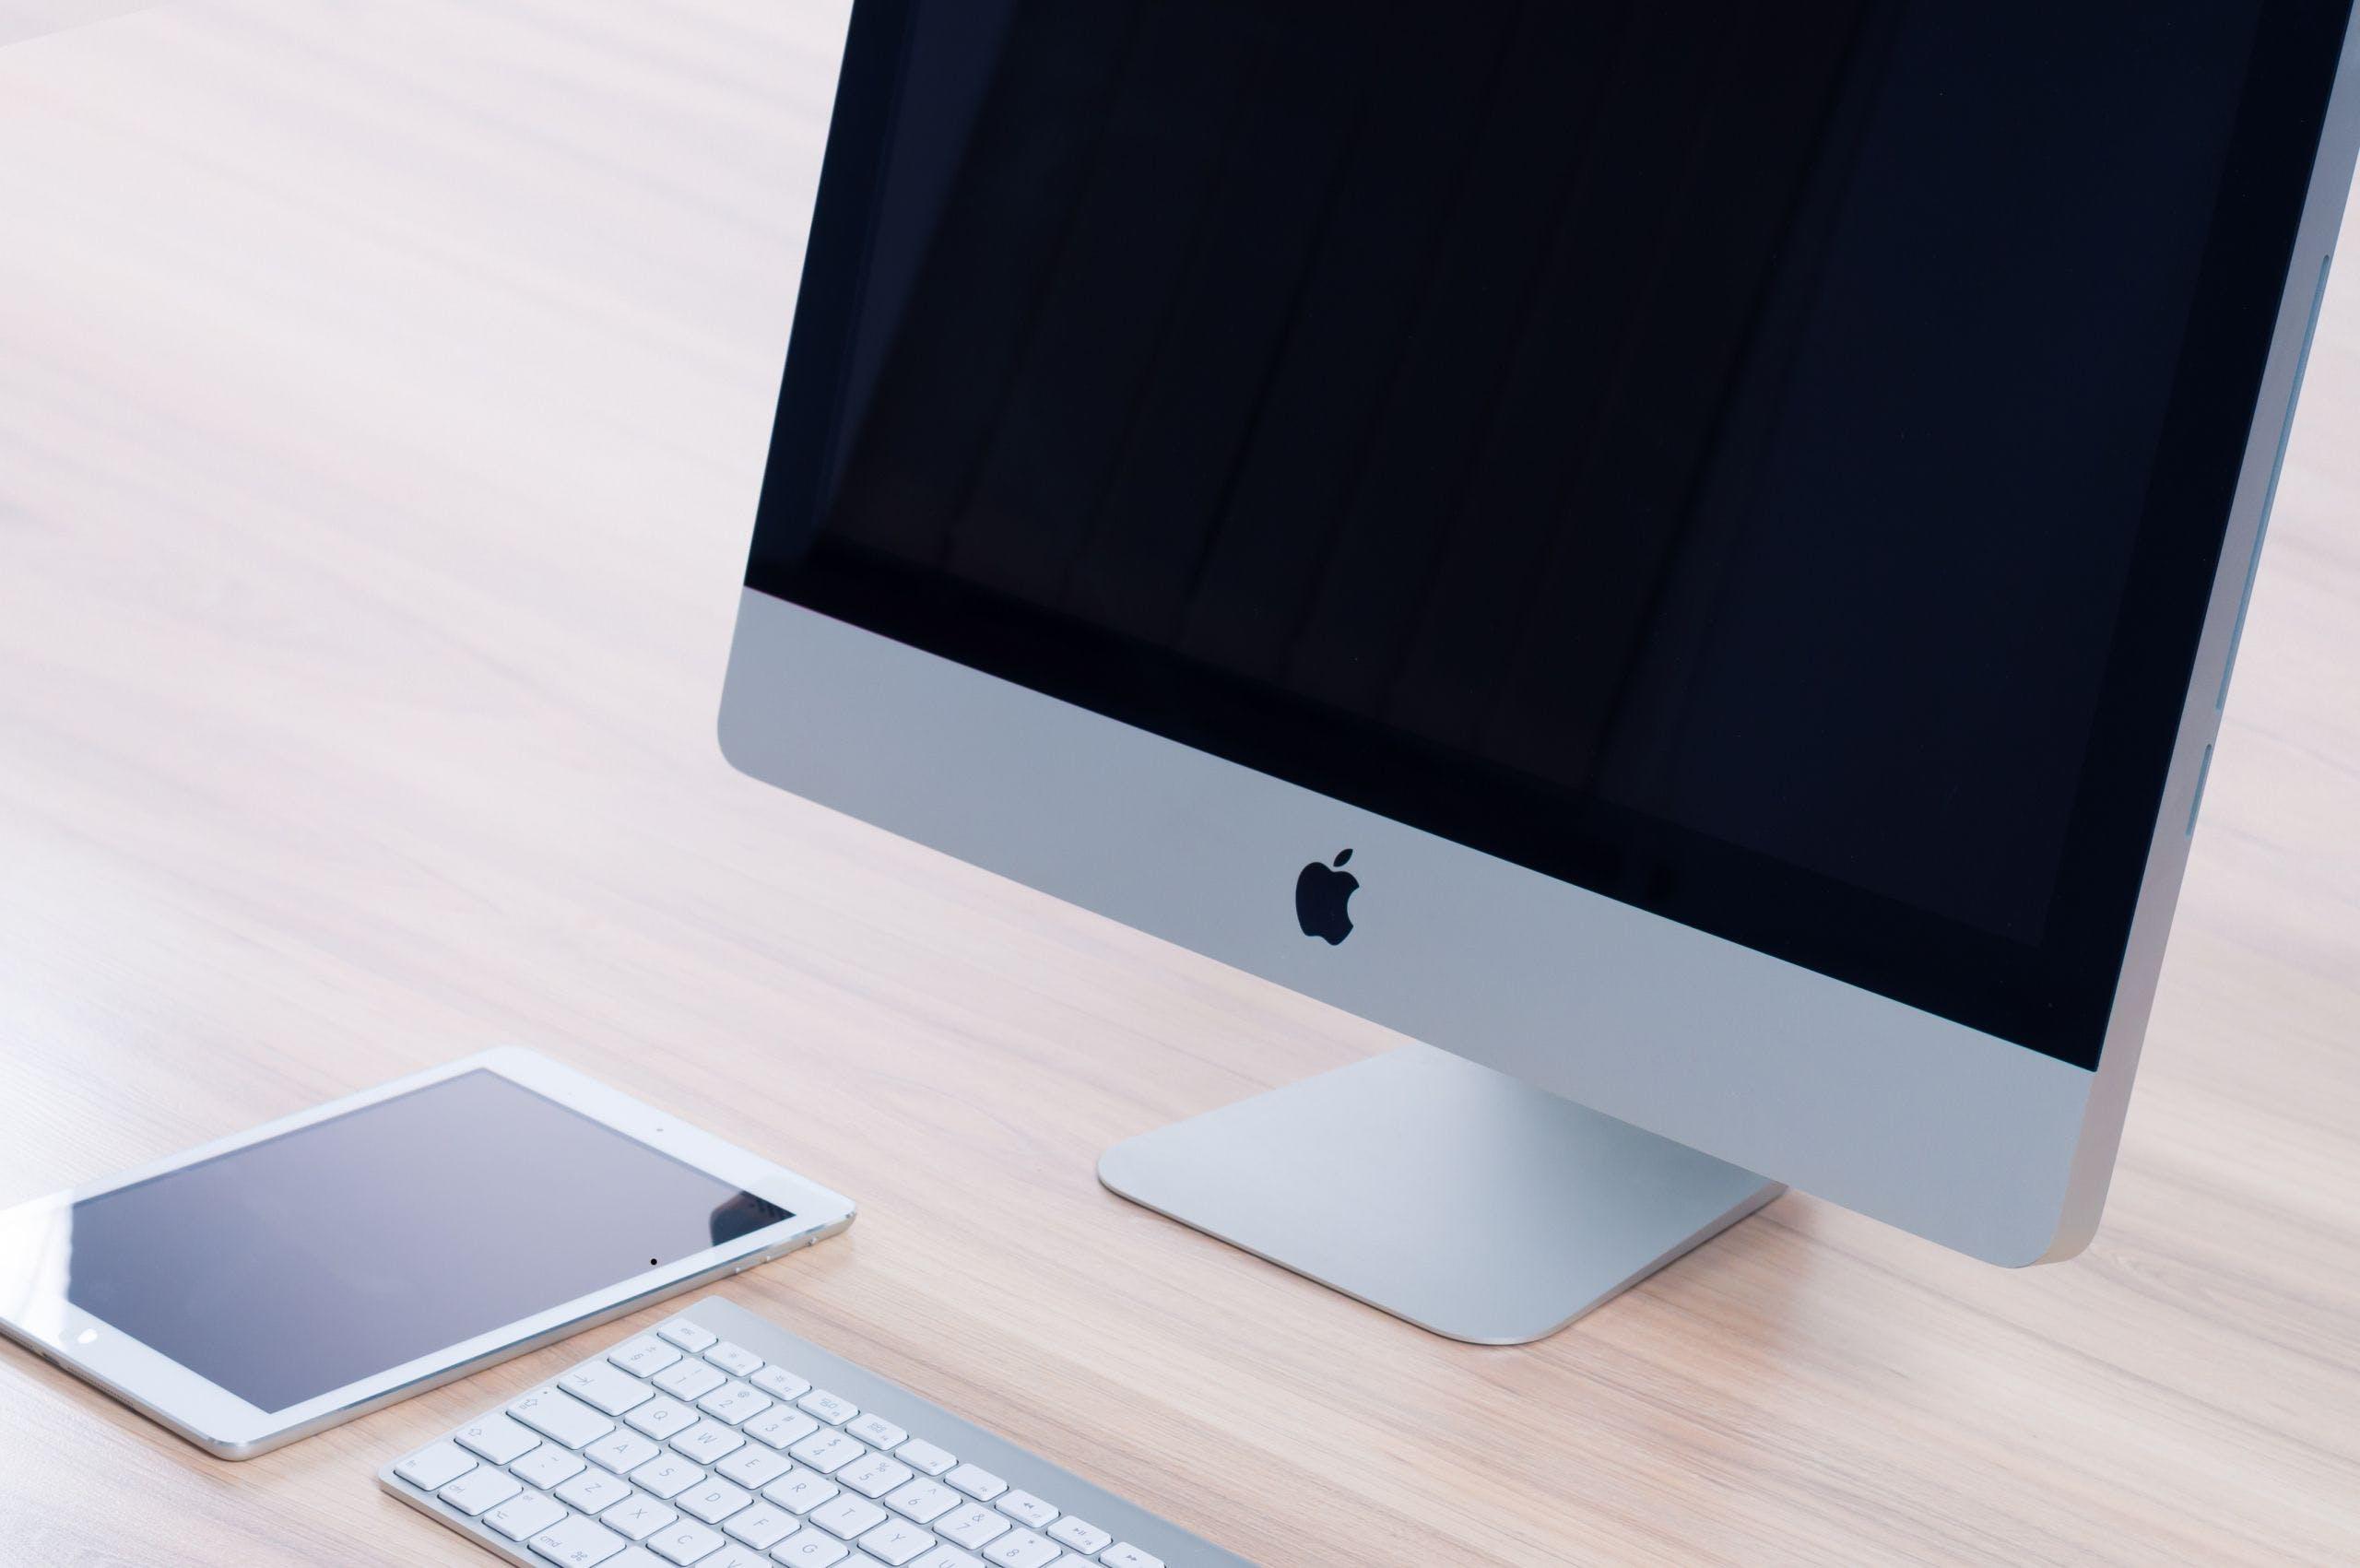 Apple Computer Hd Wallpapers Wallpaper Cave